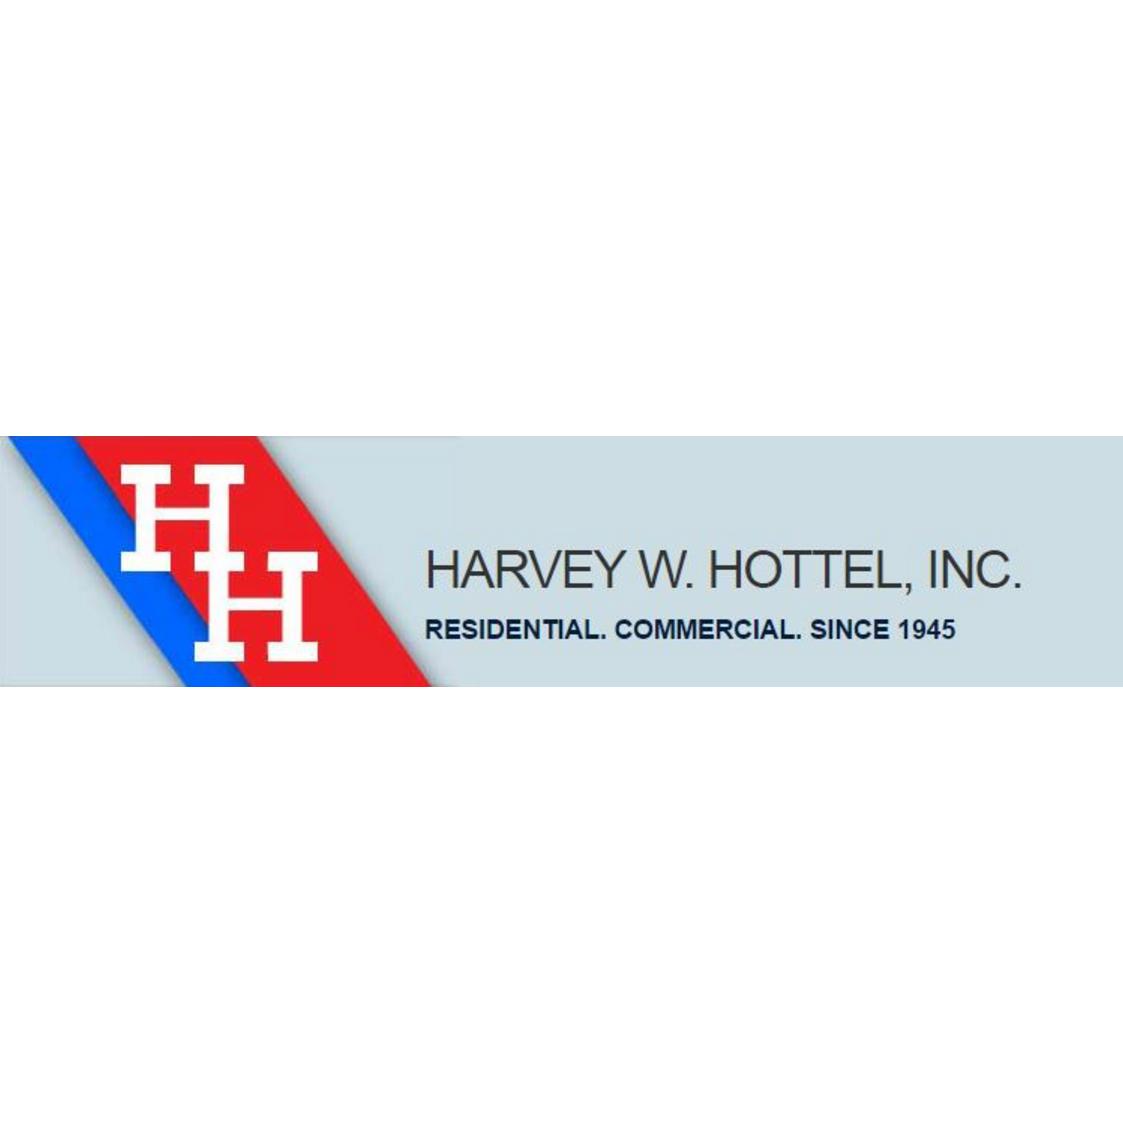 Harvey W Hottel. Inc.